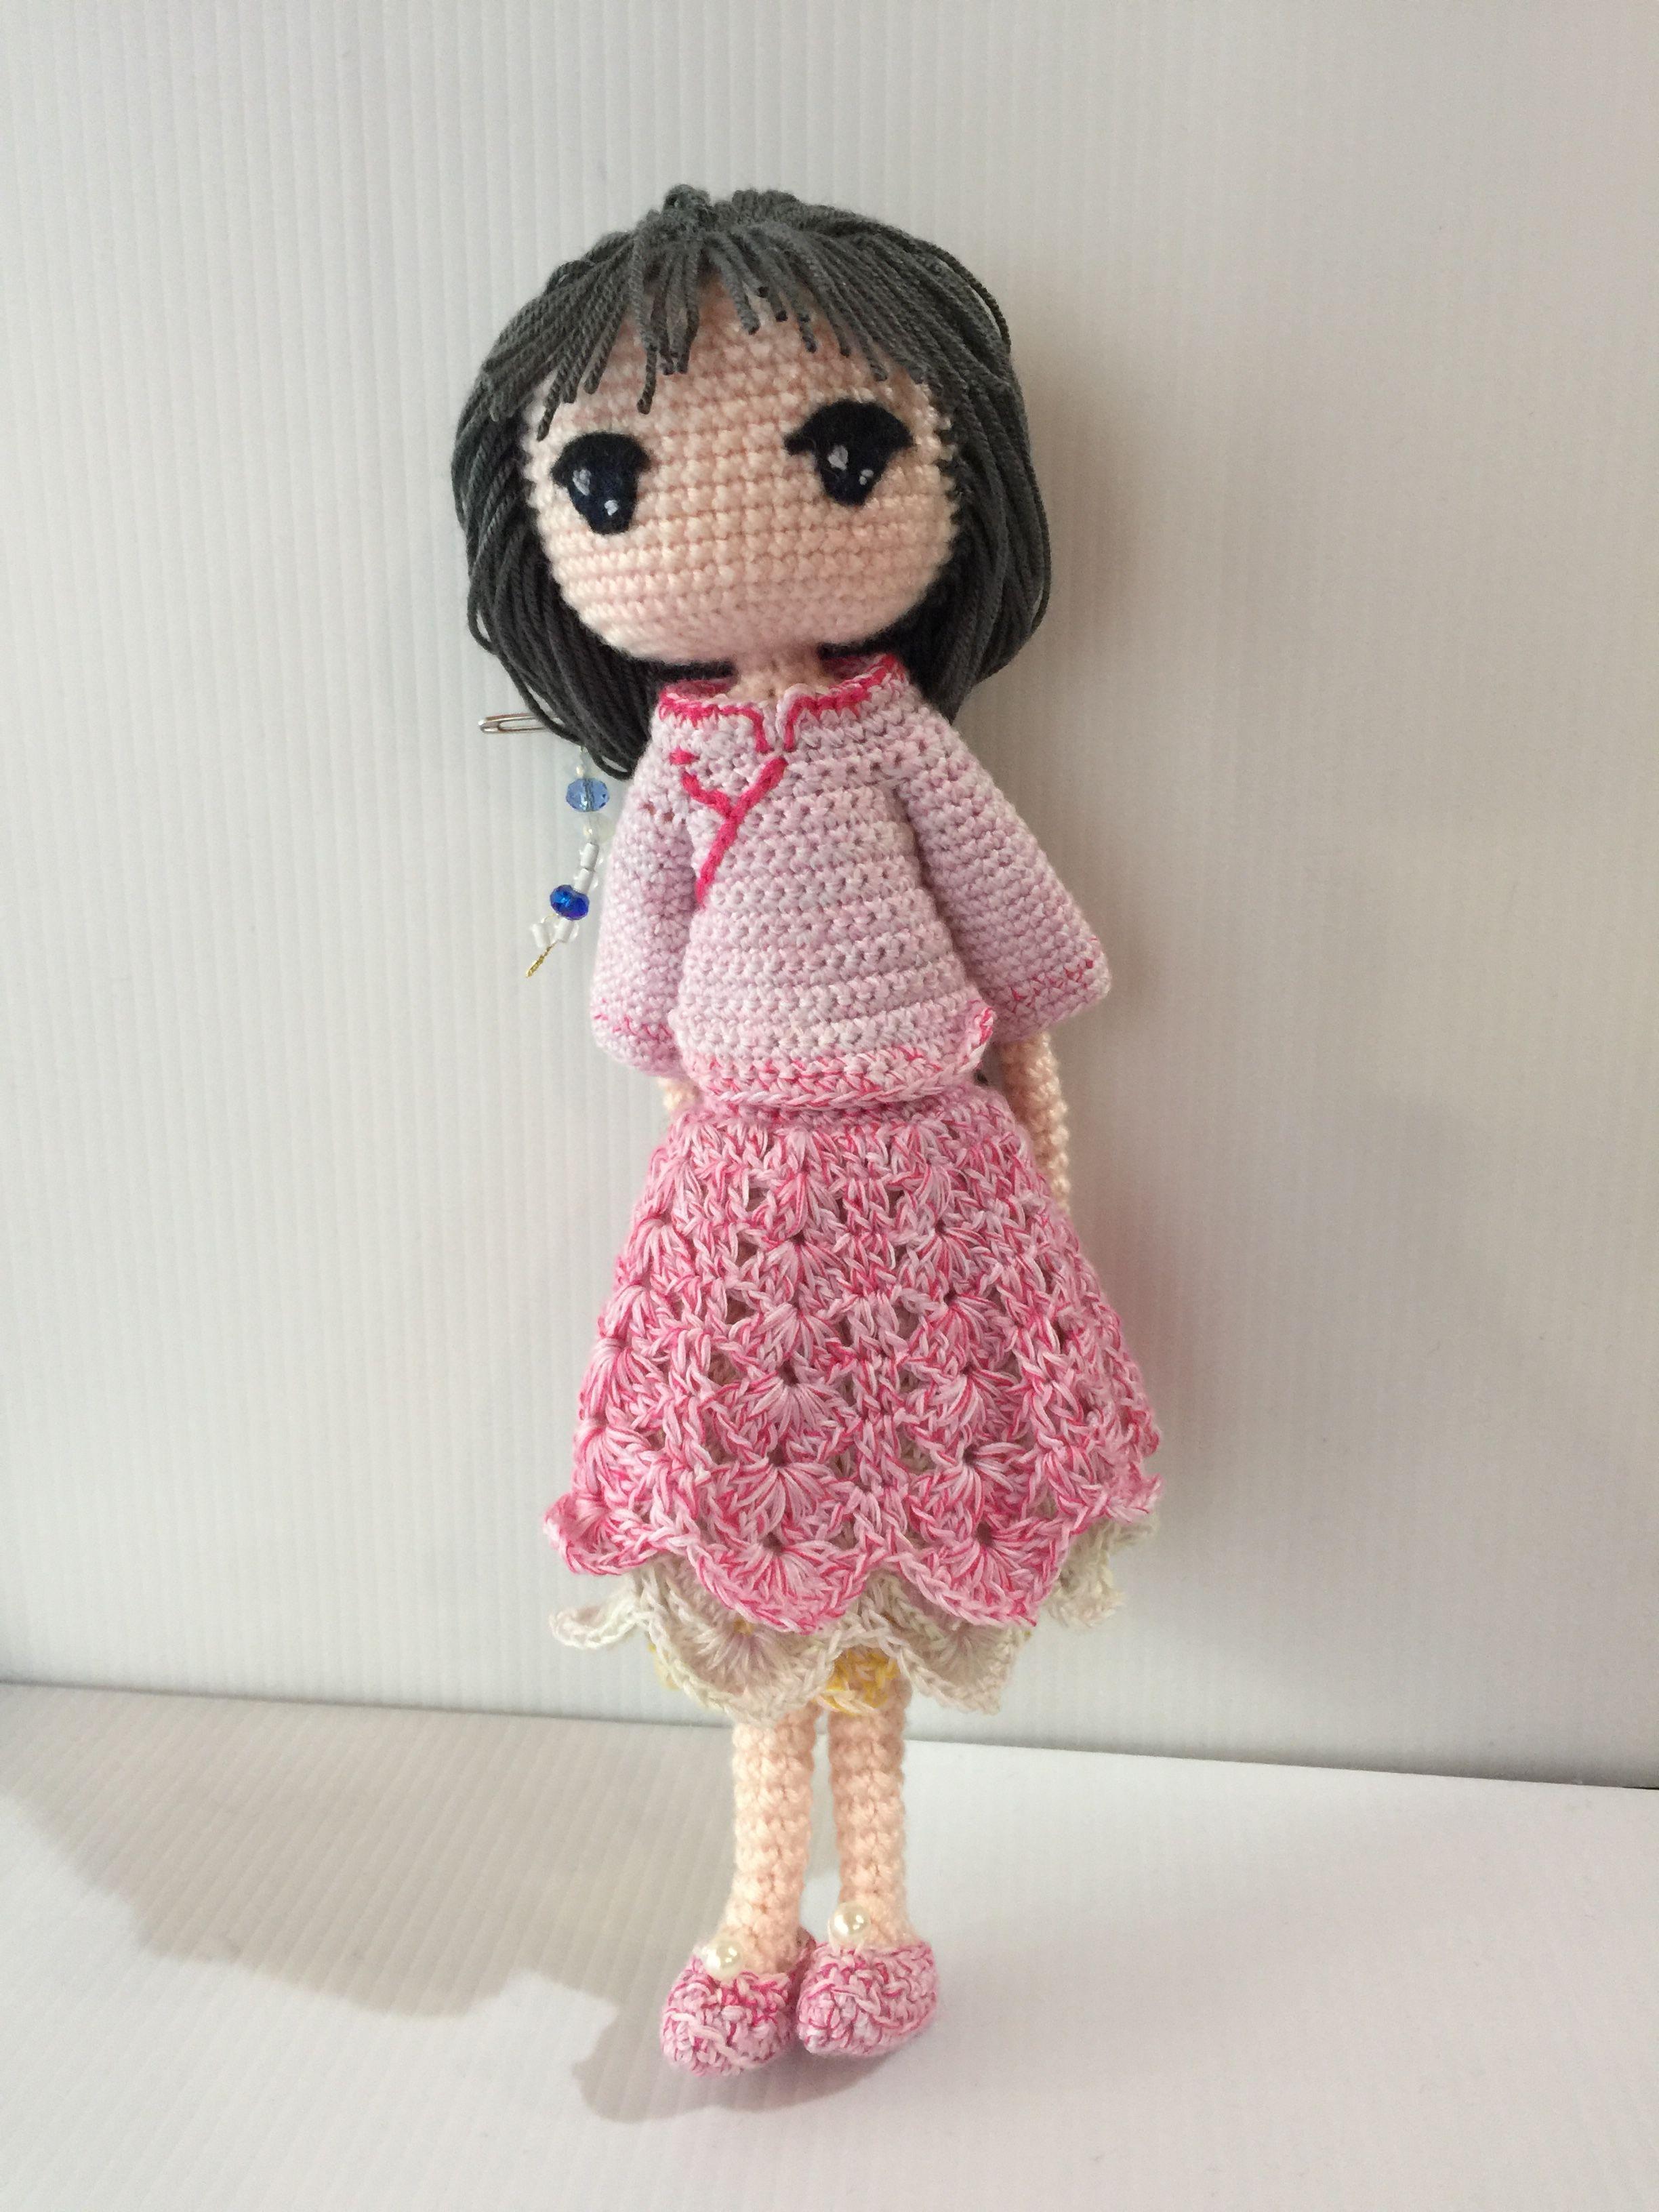 Pin von Sonja Kuan auf Handmade doll | Pinterest